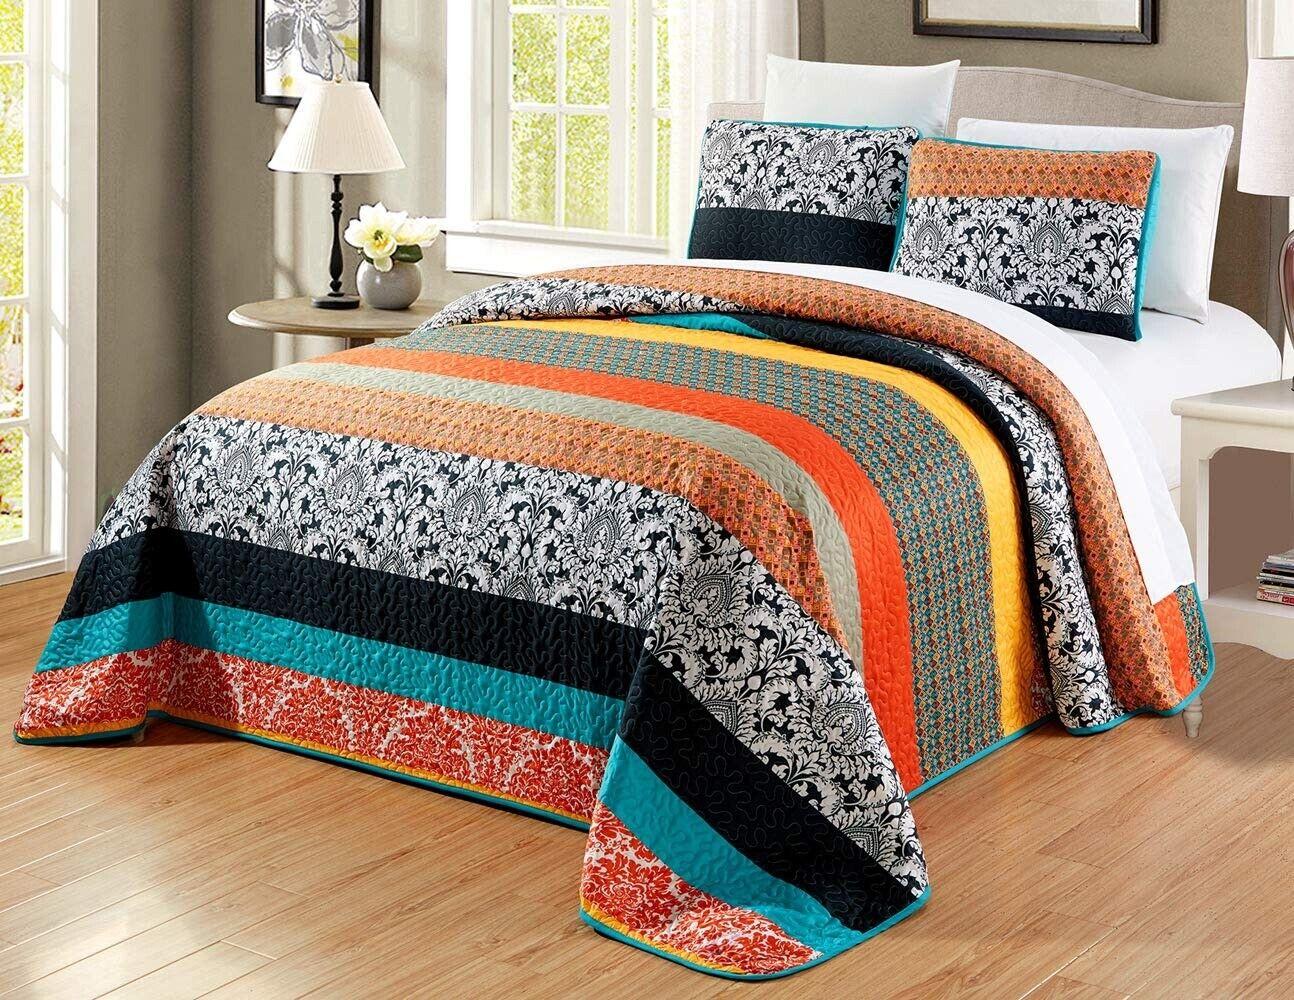 Picture of: Multi Color Striped Blue Orange Black Reversible Queen Size Coverlet Bedspread For Sale Online